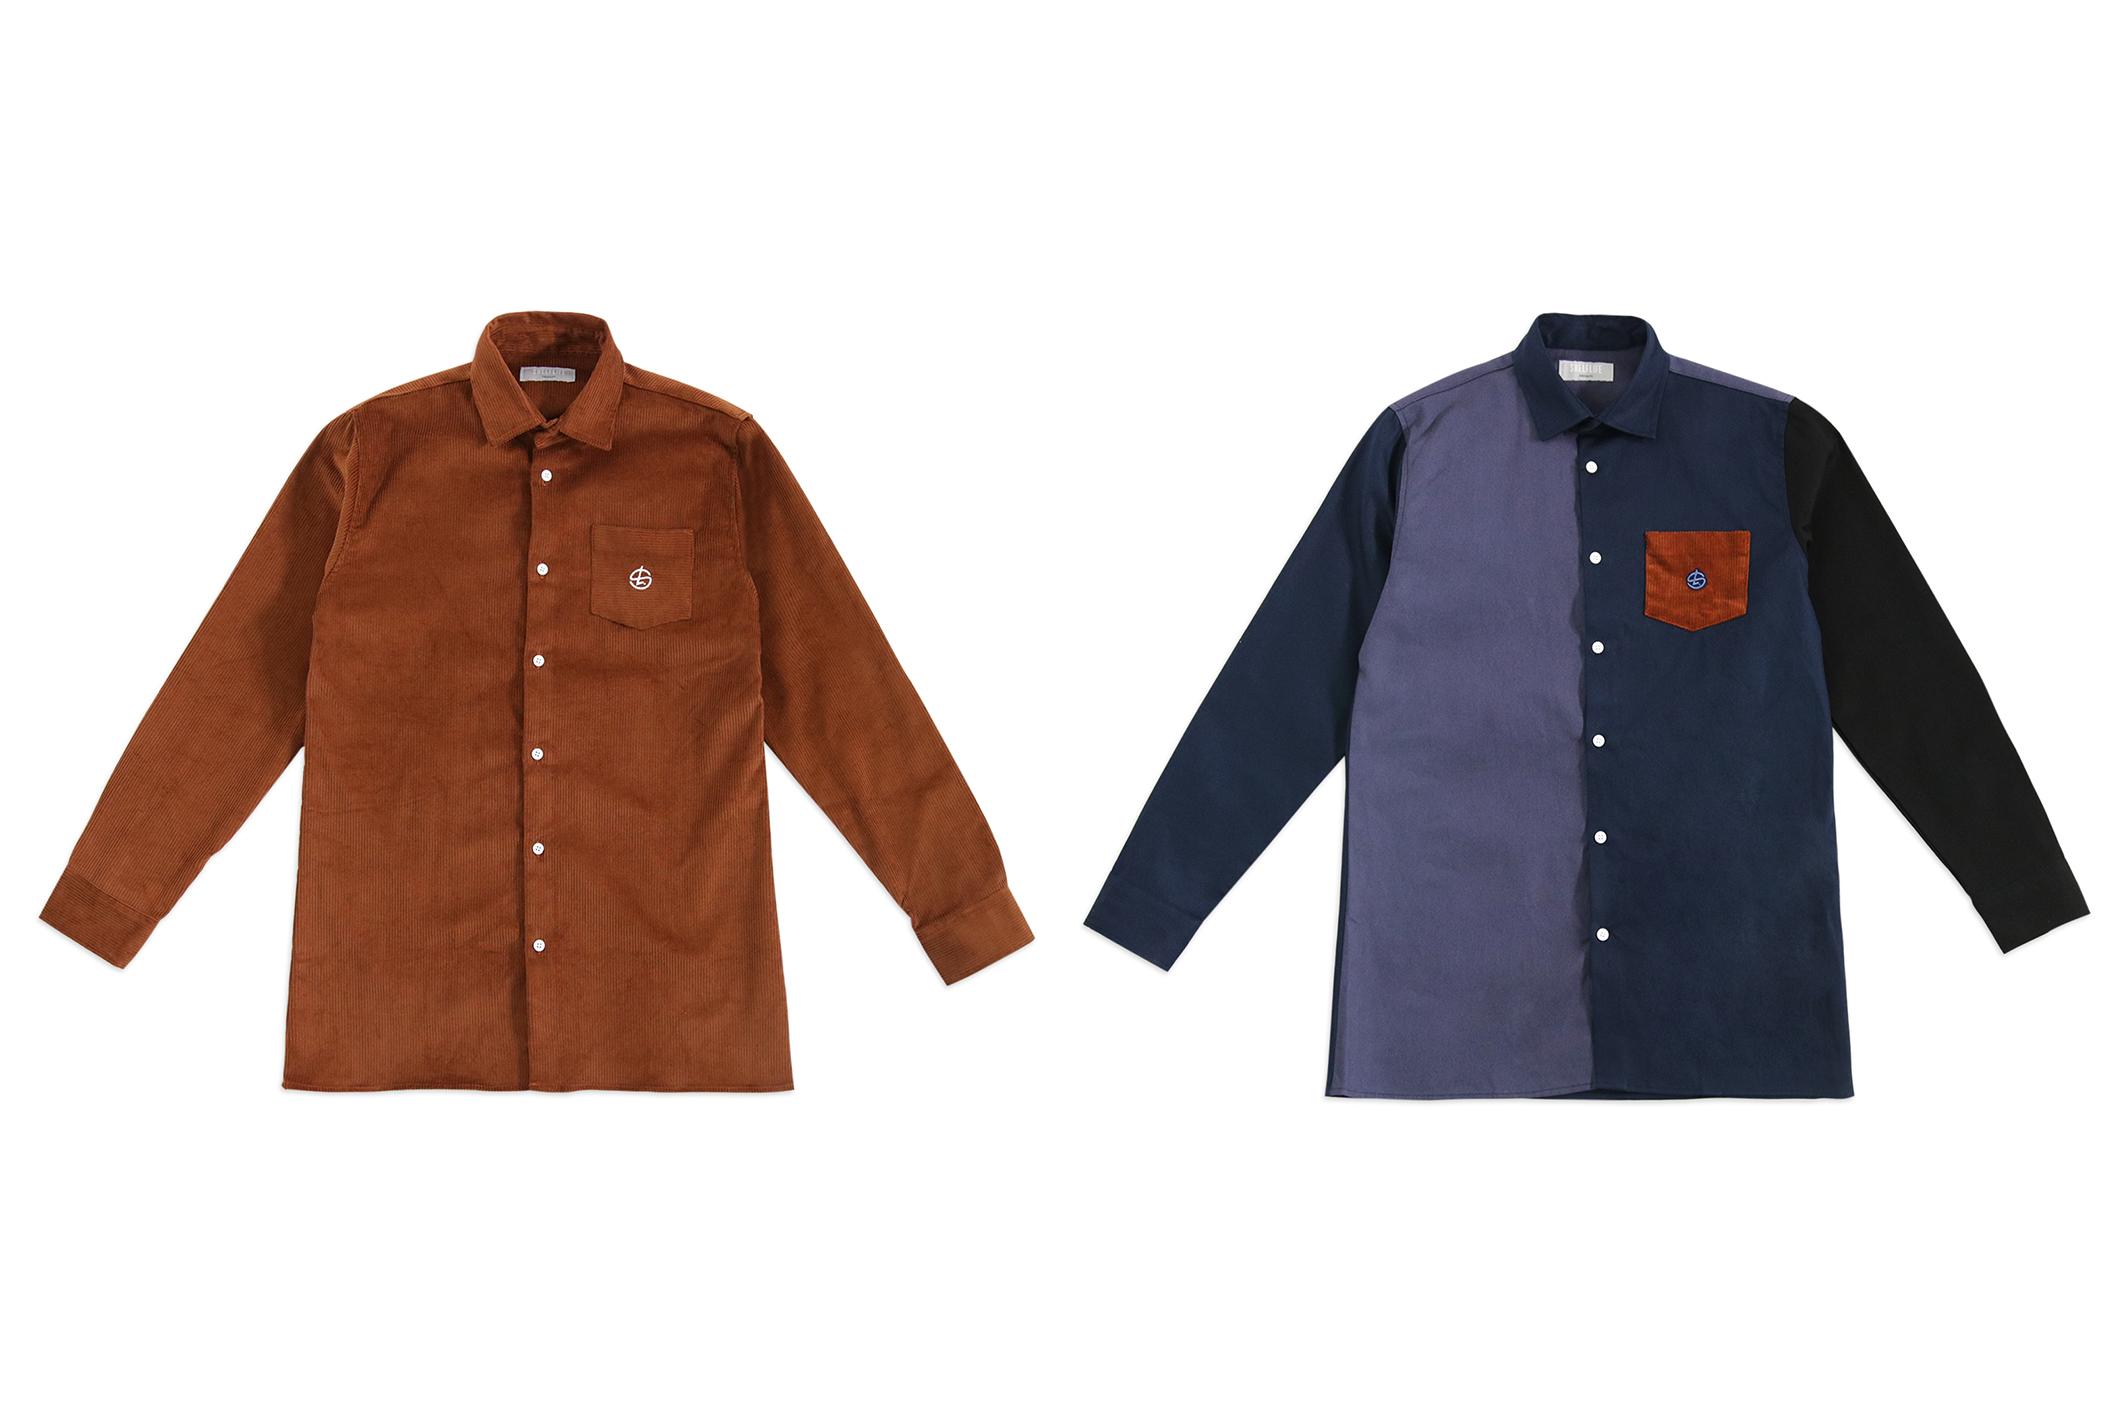 Shelflife W20 Button-Up Shirts Corduroy and Navy